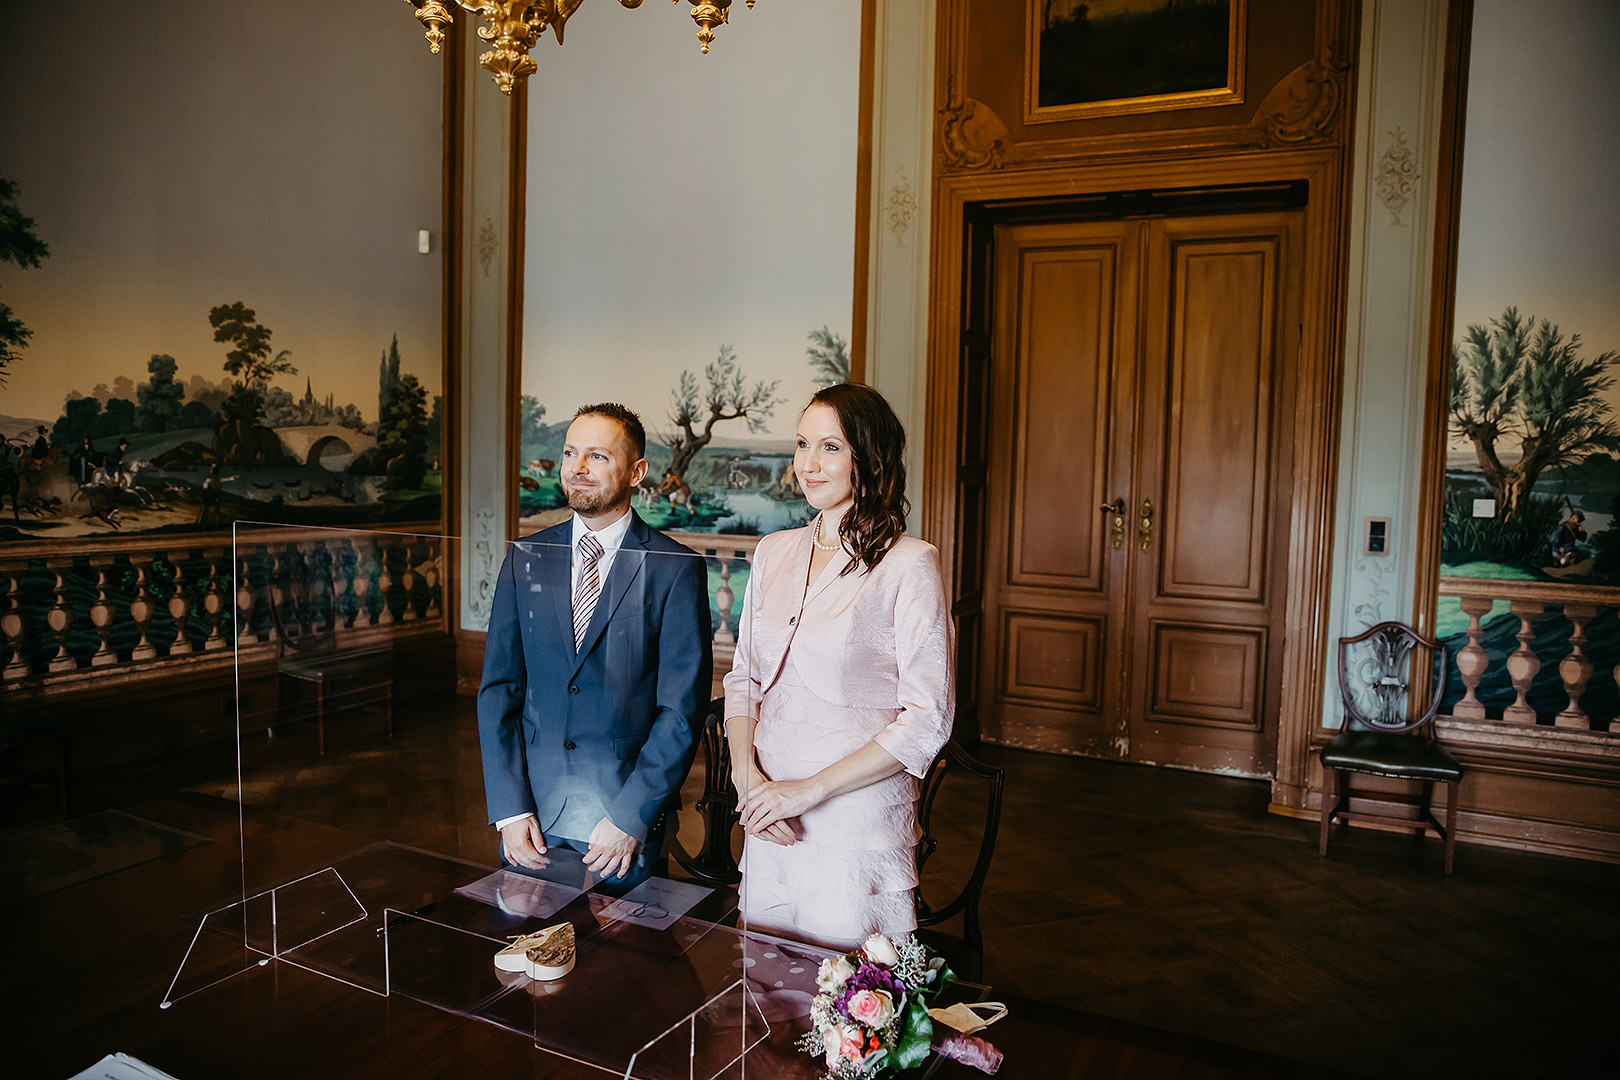 portrait_wedding_claudiaundpatrick_10